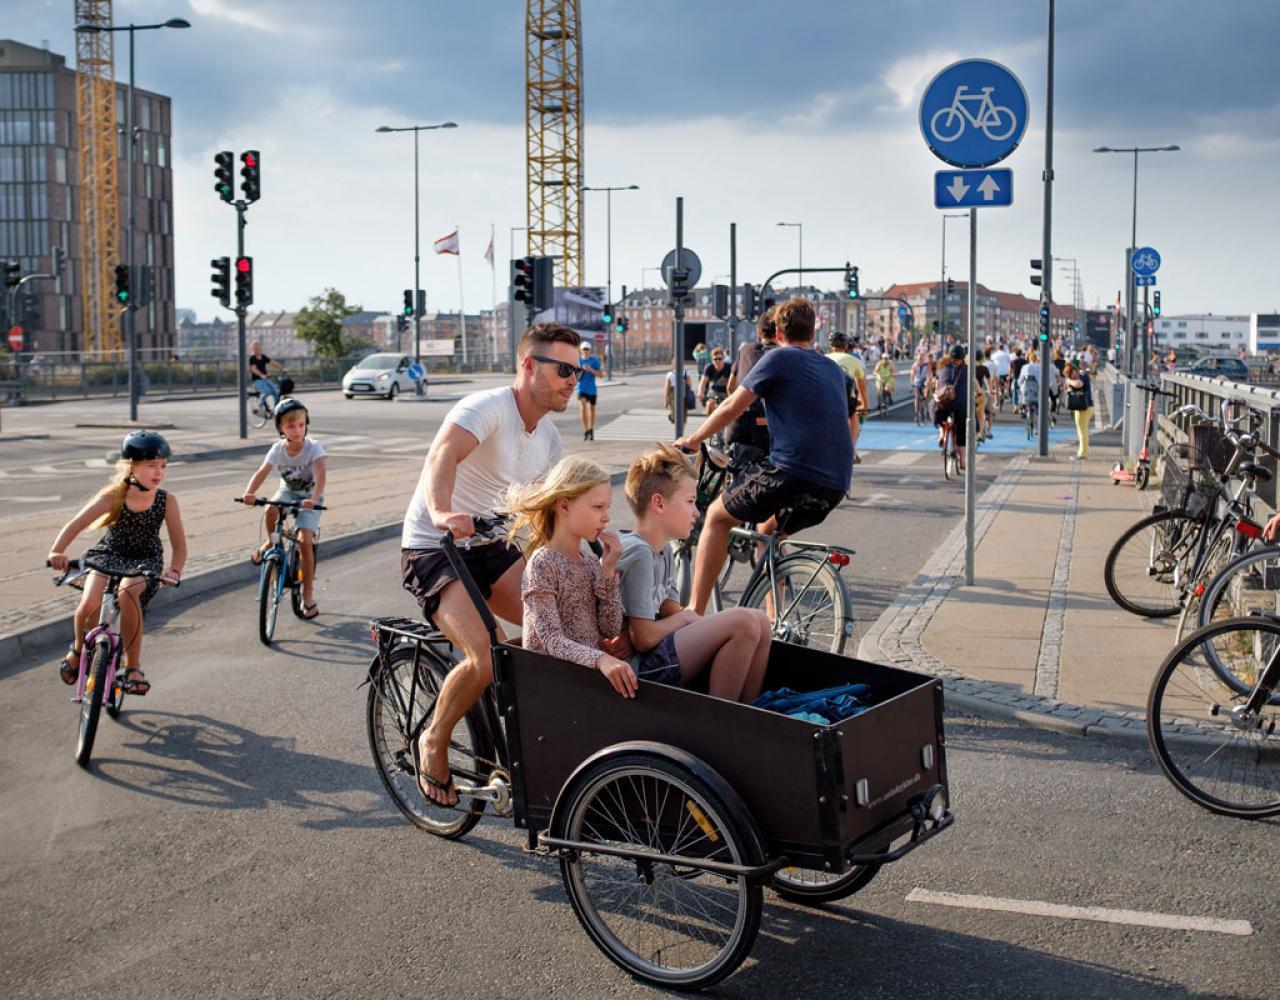 københavn christiania cykel børn dybbølsbro